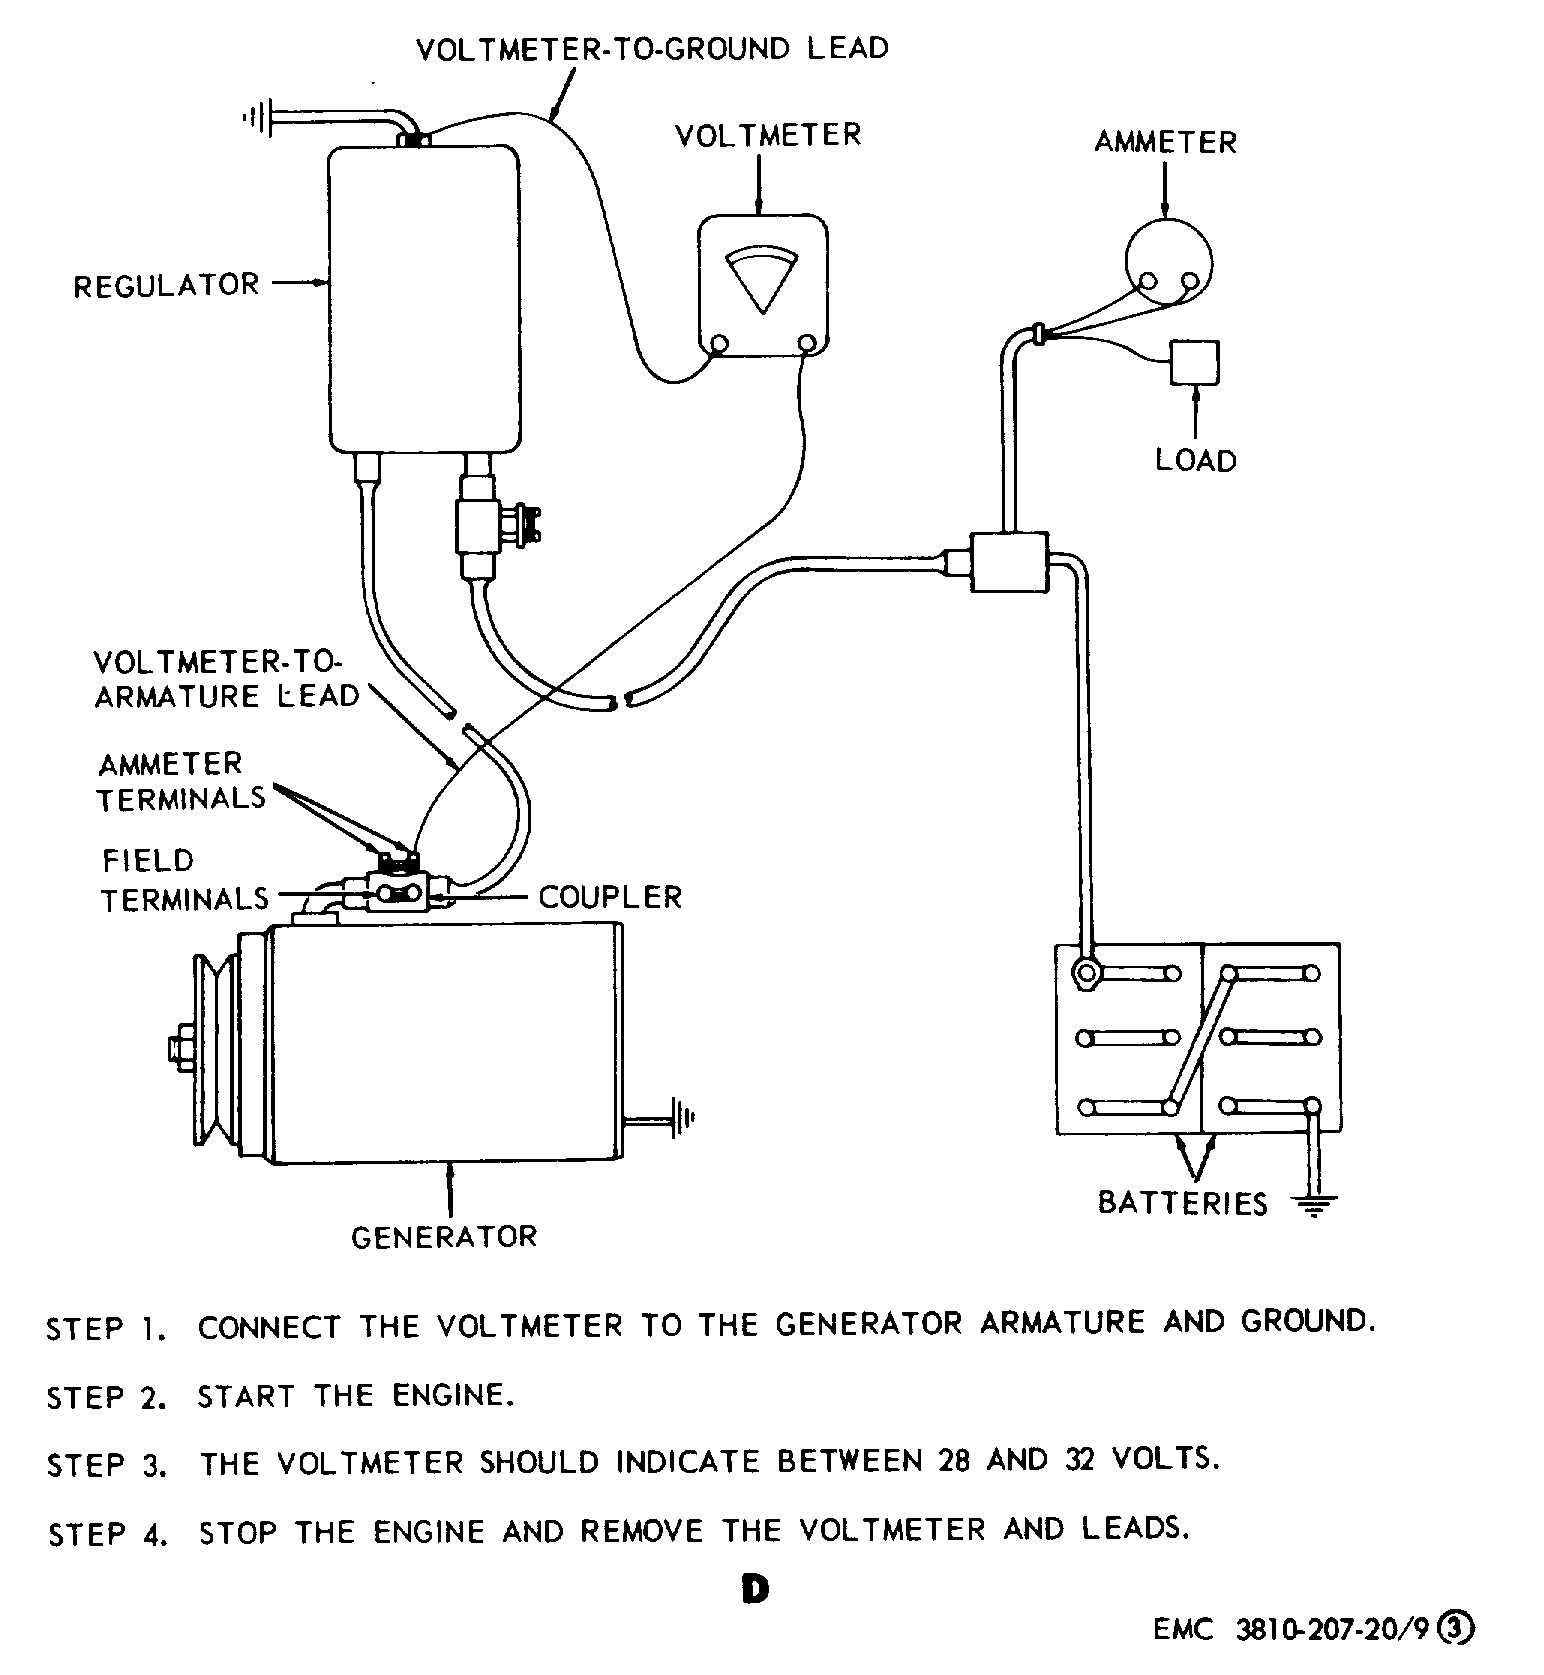 generac starter generator wiring diagram com generac running watts